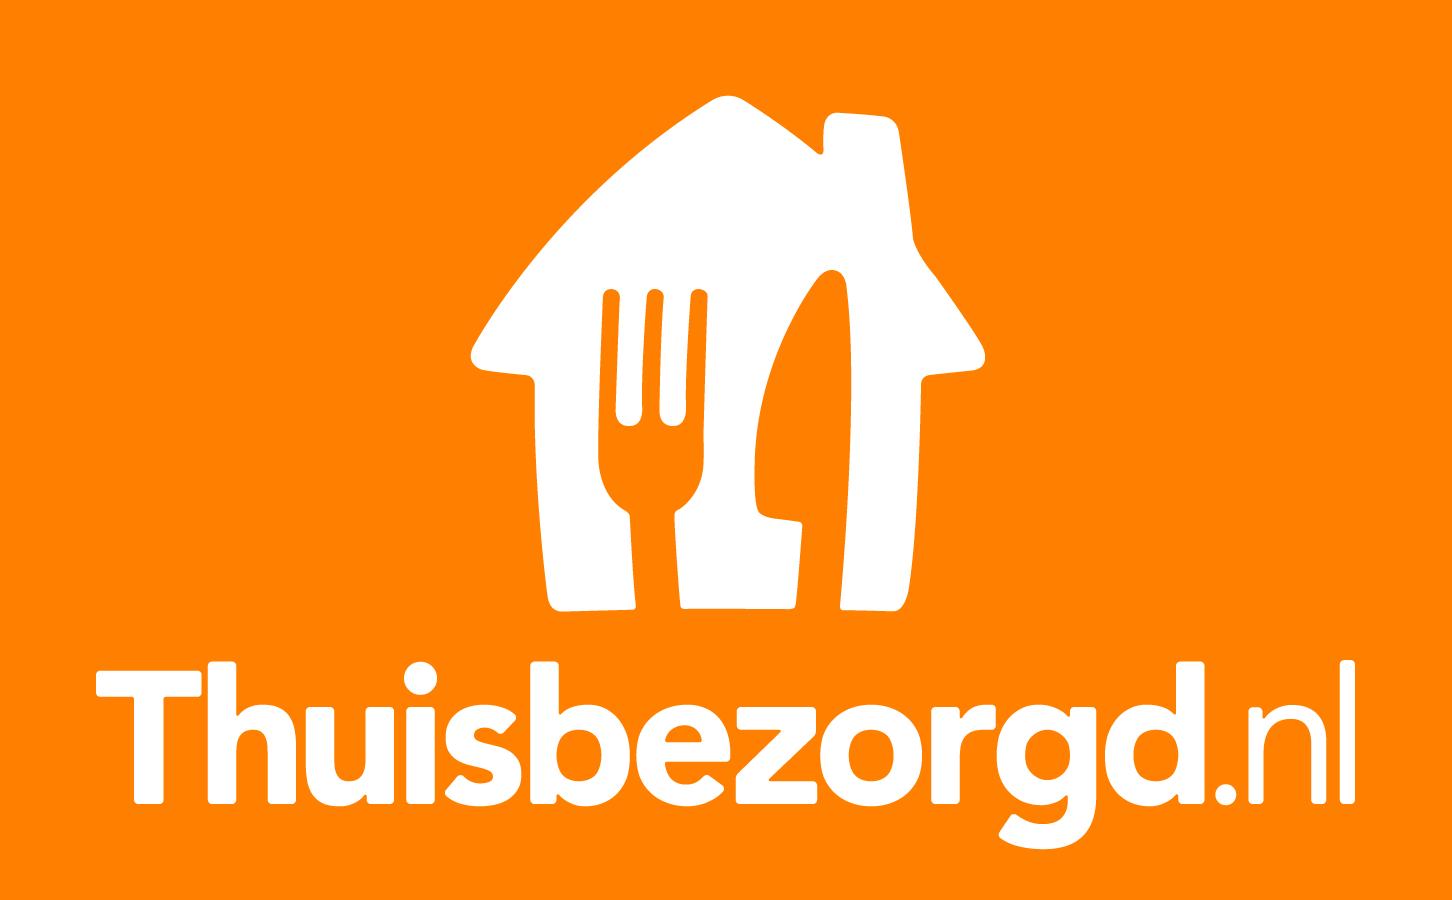 thuisbezorgdnl-logo-oranje.png